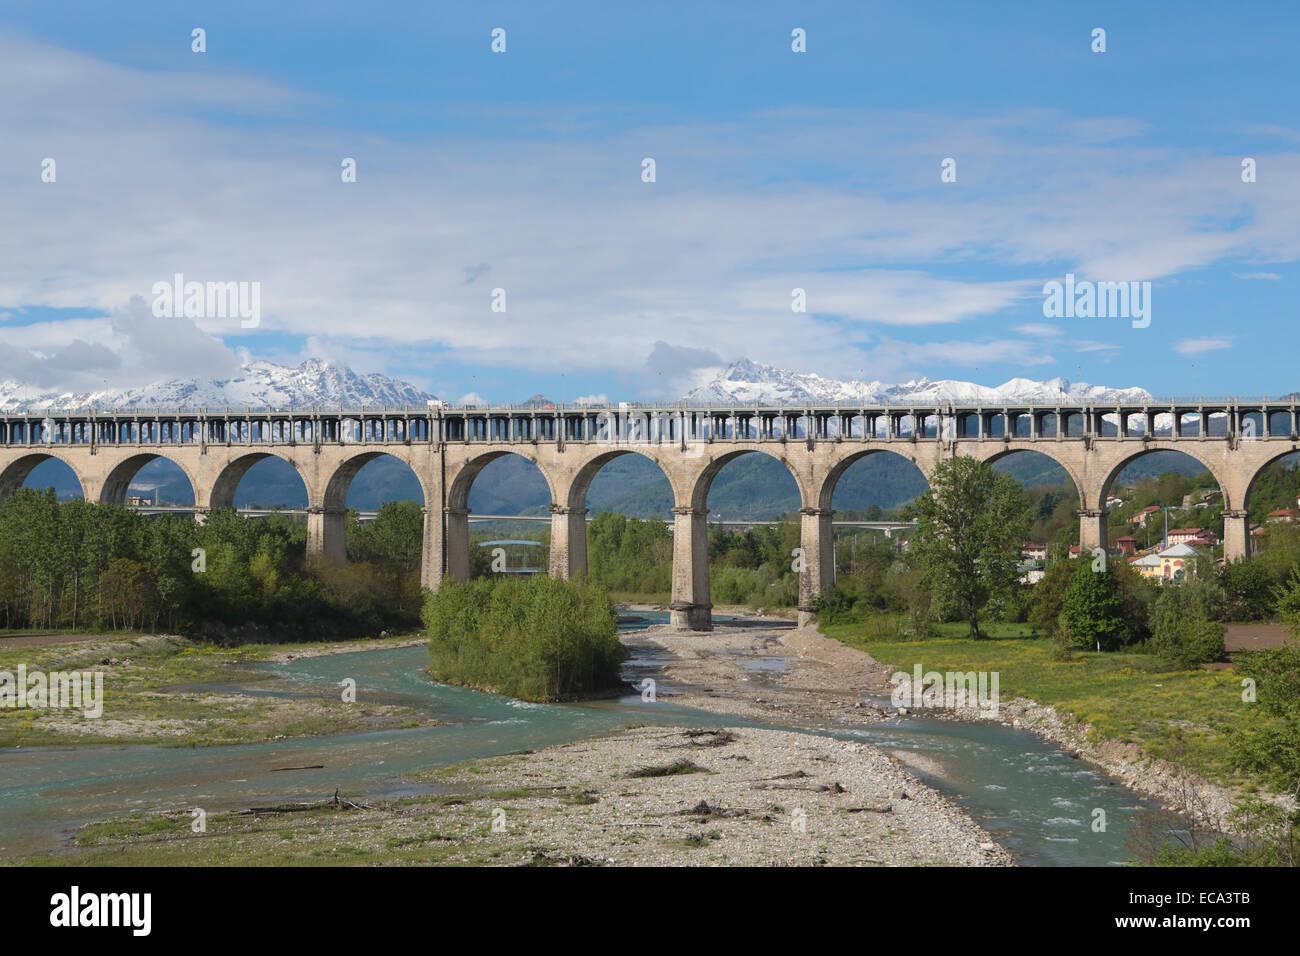 Bridge over the Torrente Gesso, Cuneo, Piedmont, Italy - Stock Image